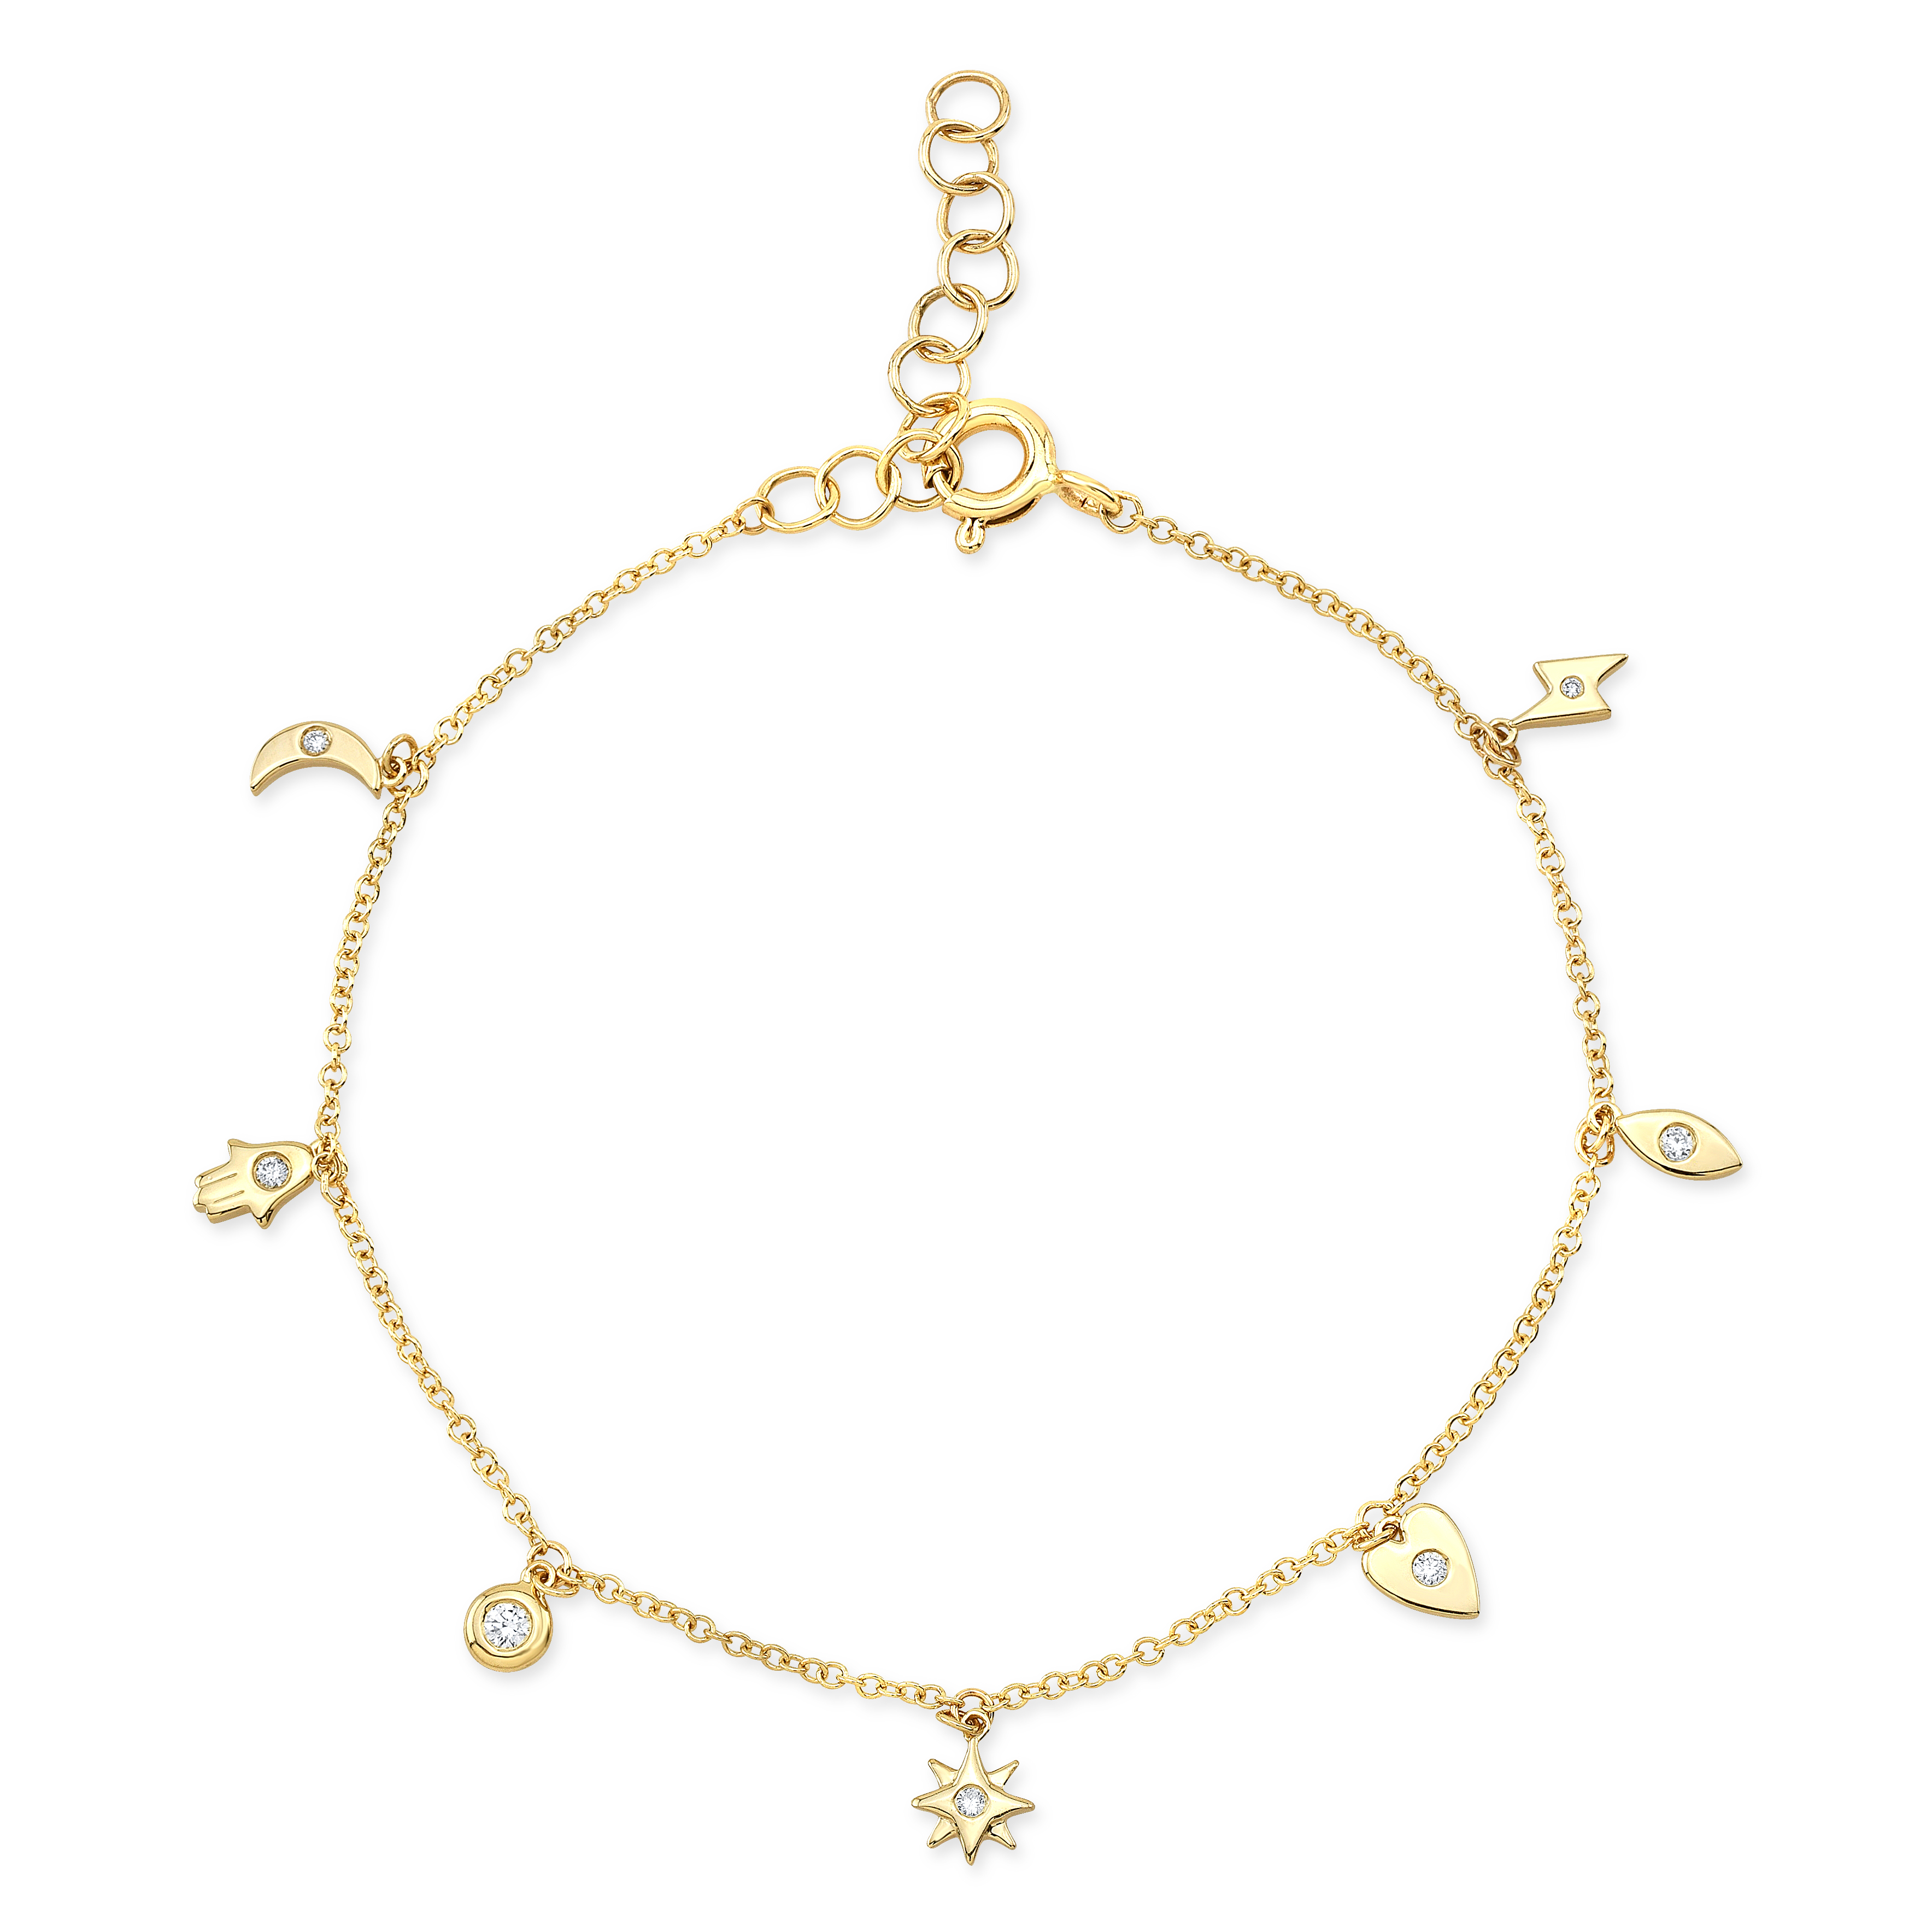 Mjolie charm bracelet